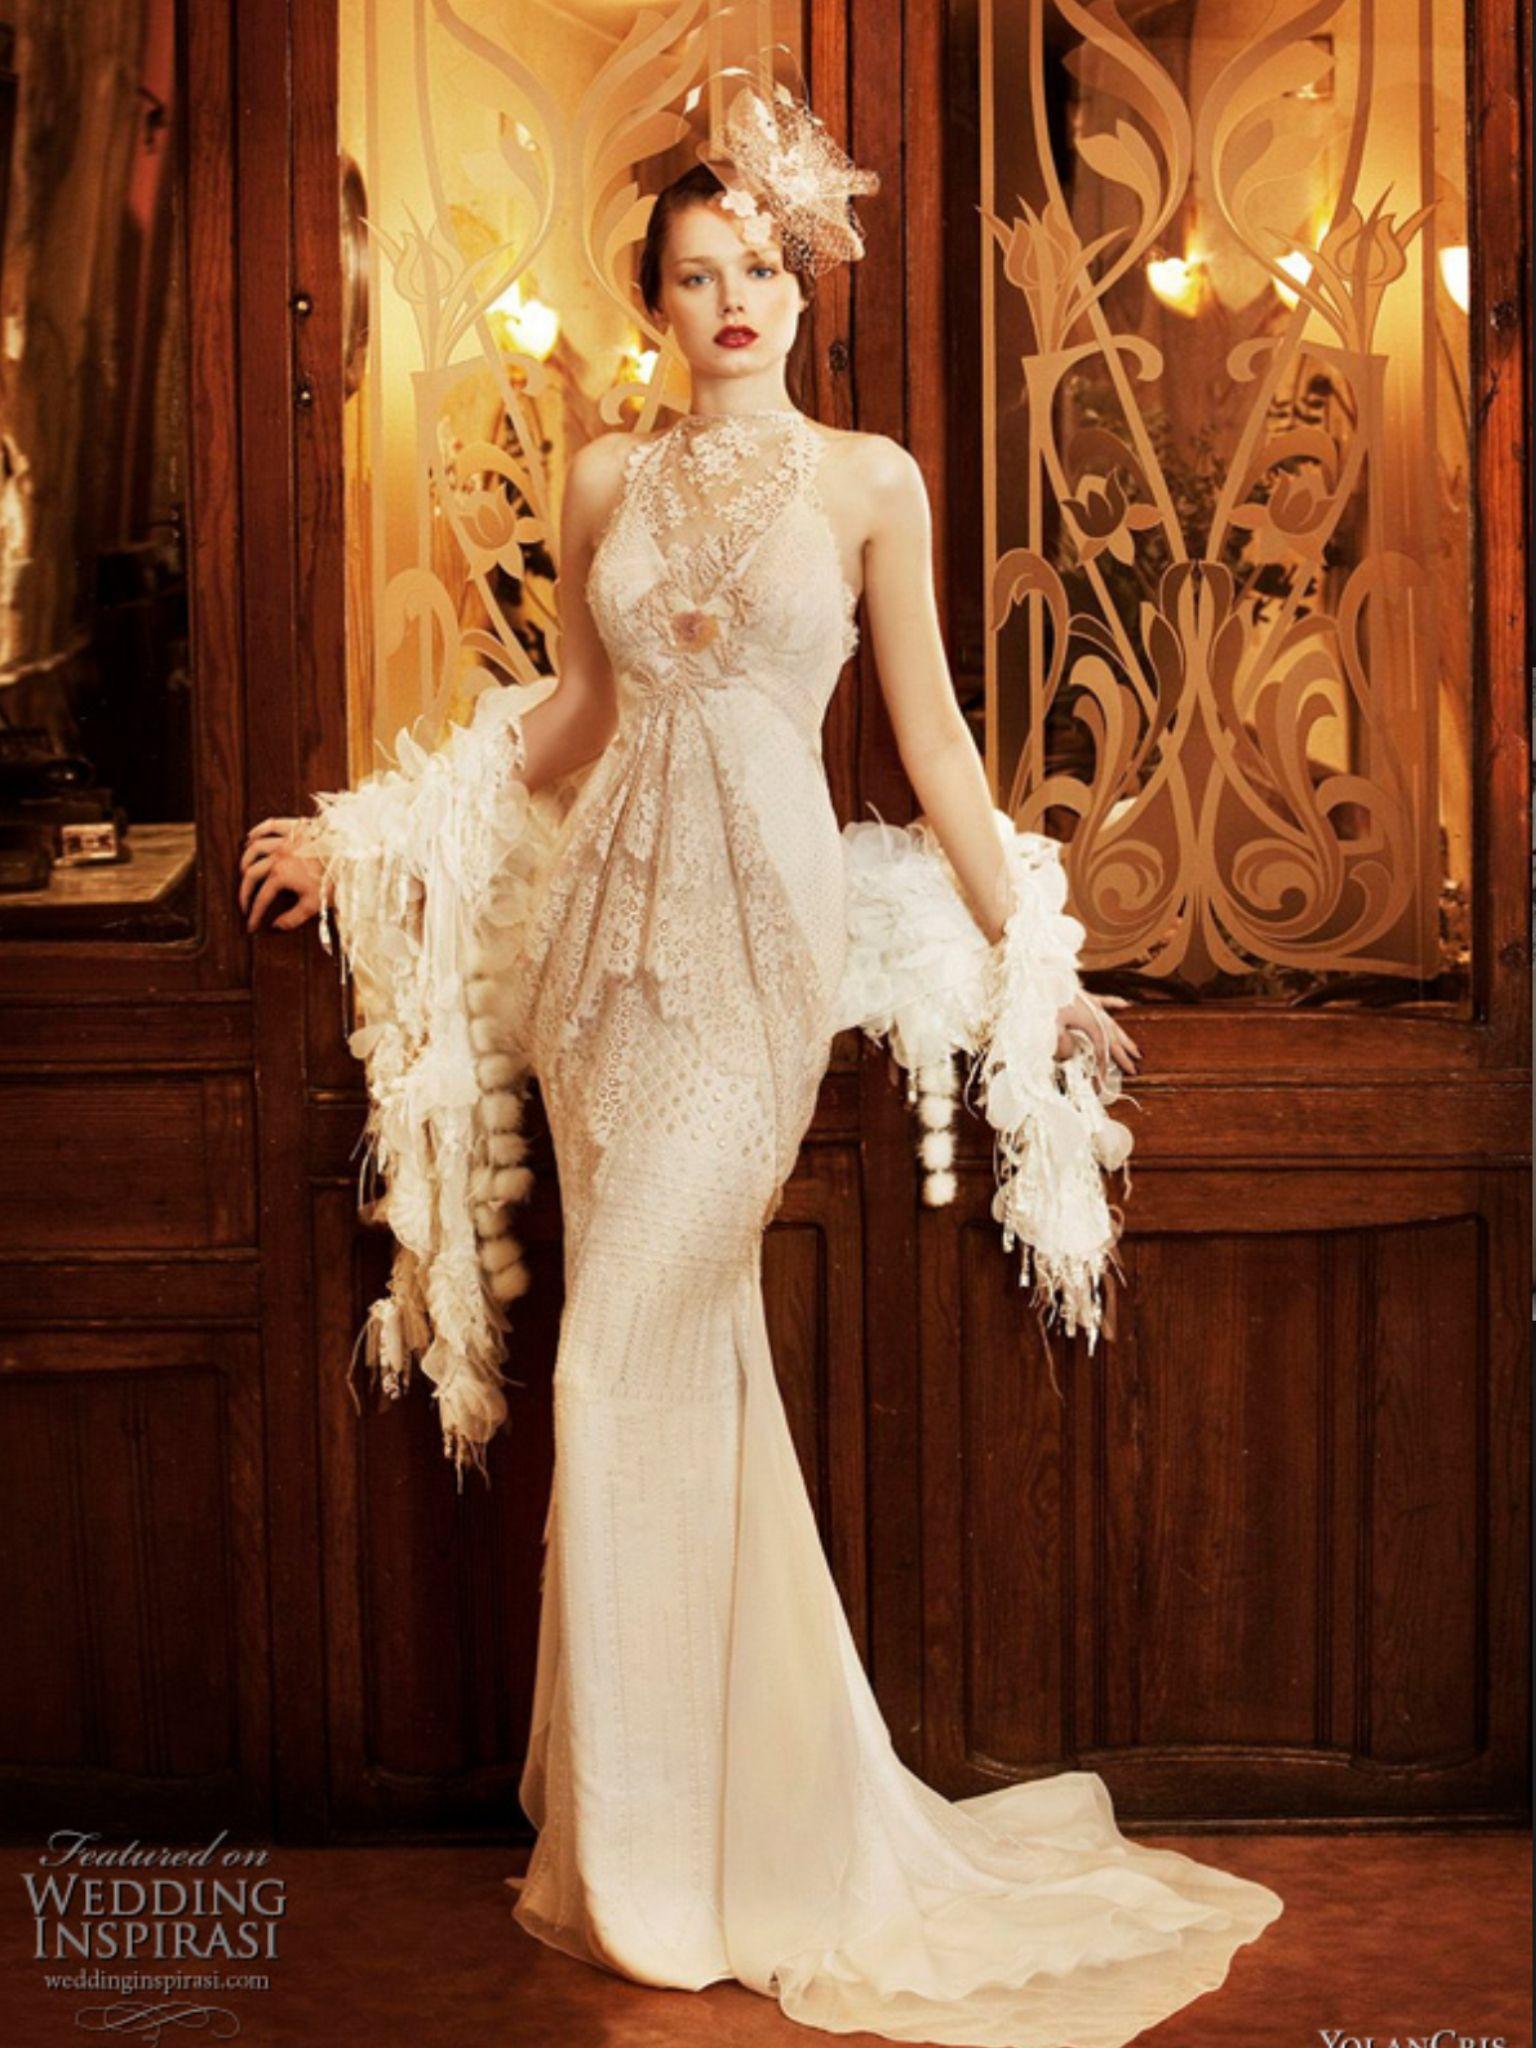 1920's style wedding dress Vintage dresses, Wedding